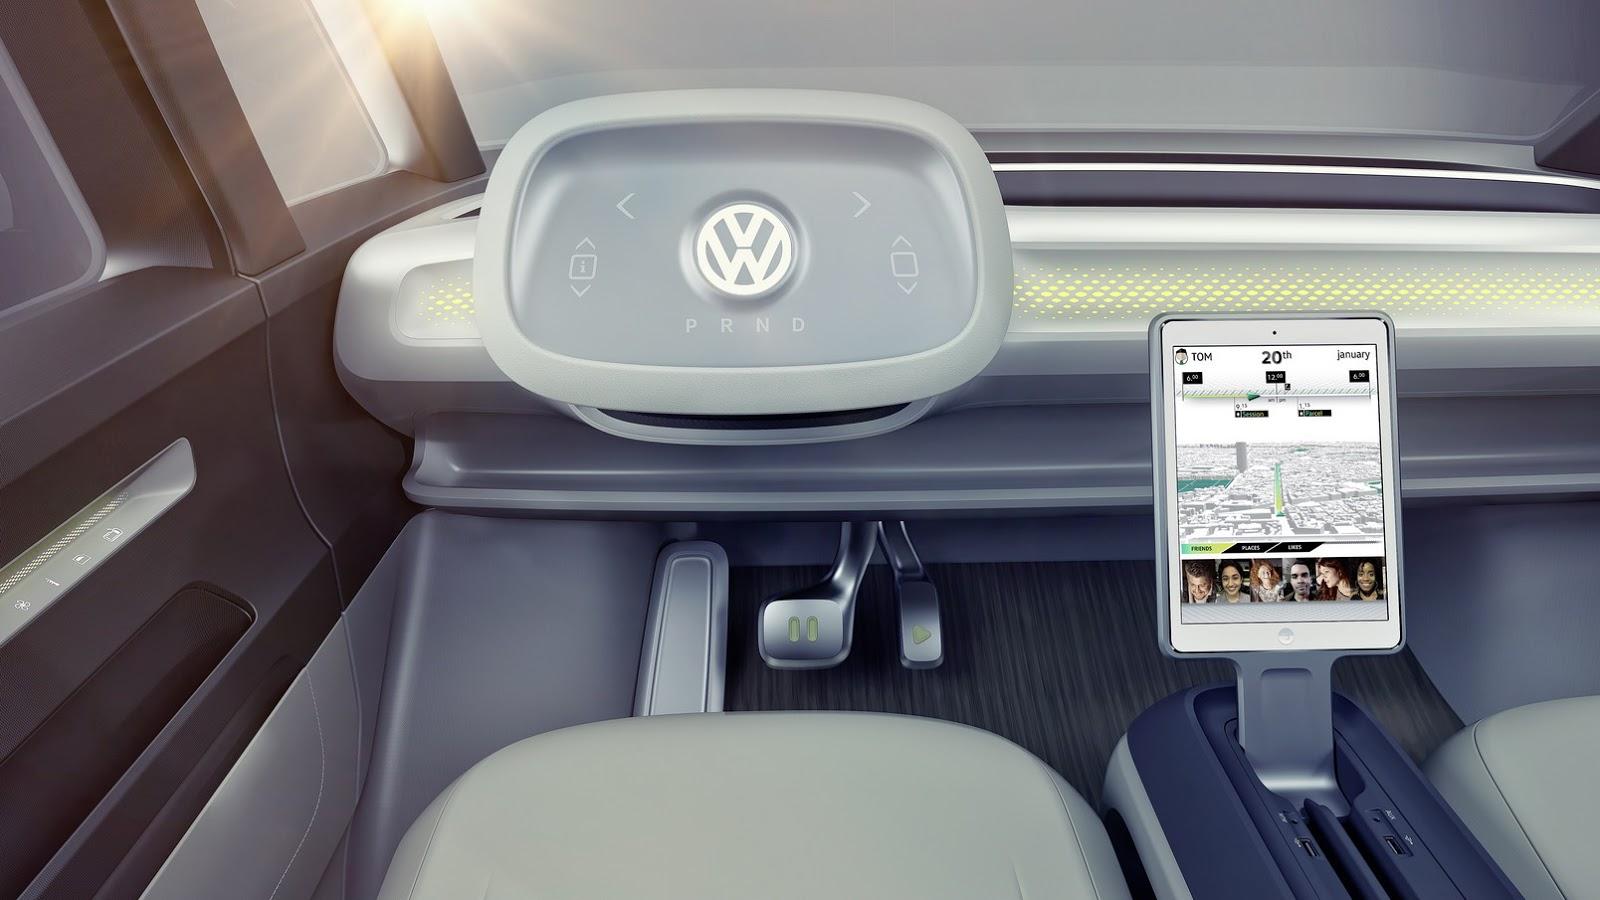 Volkswagen I.D. Buzz Concept (28)